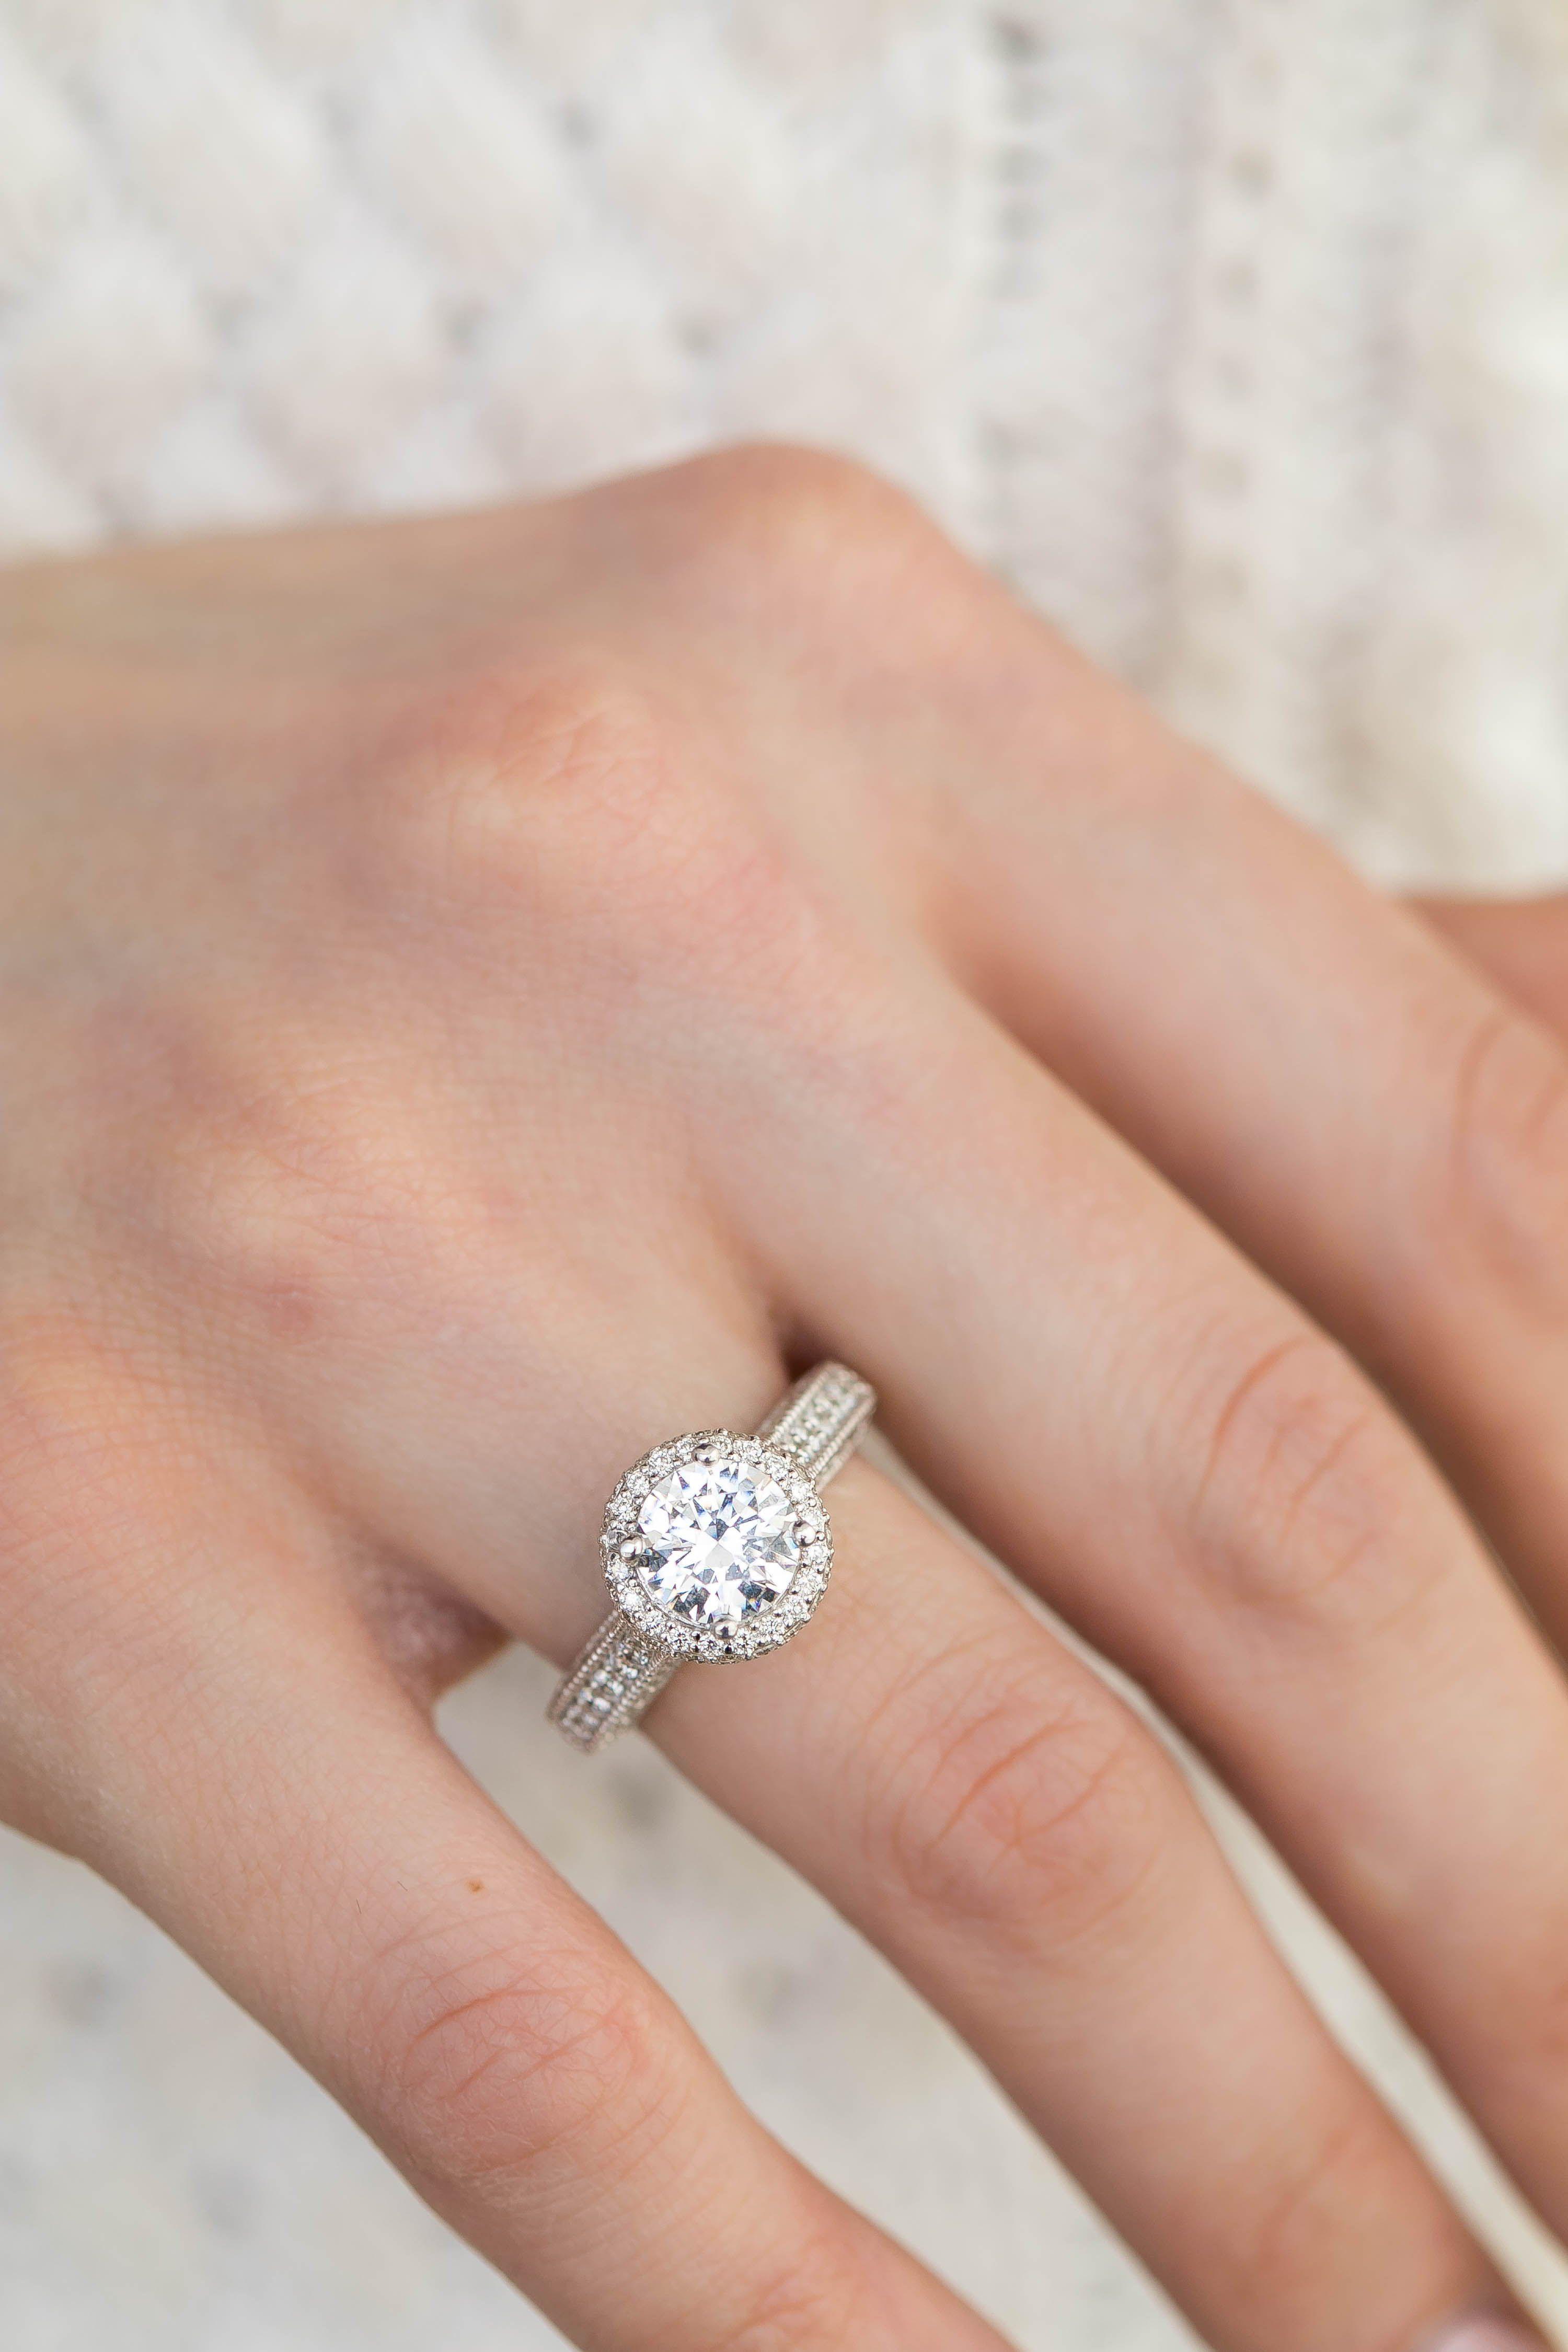 2 Carat Round Diamond Halo Engagement Ring Round Diamond Engagement Rings Halo Engagement Rings Engagement